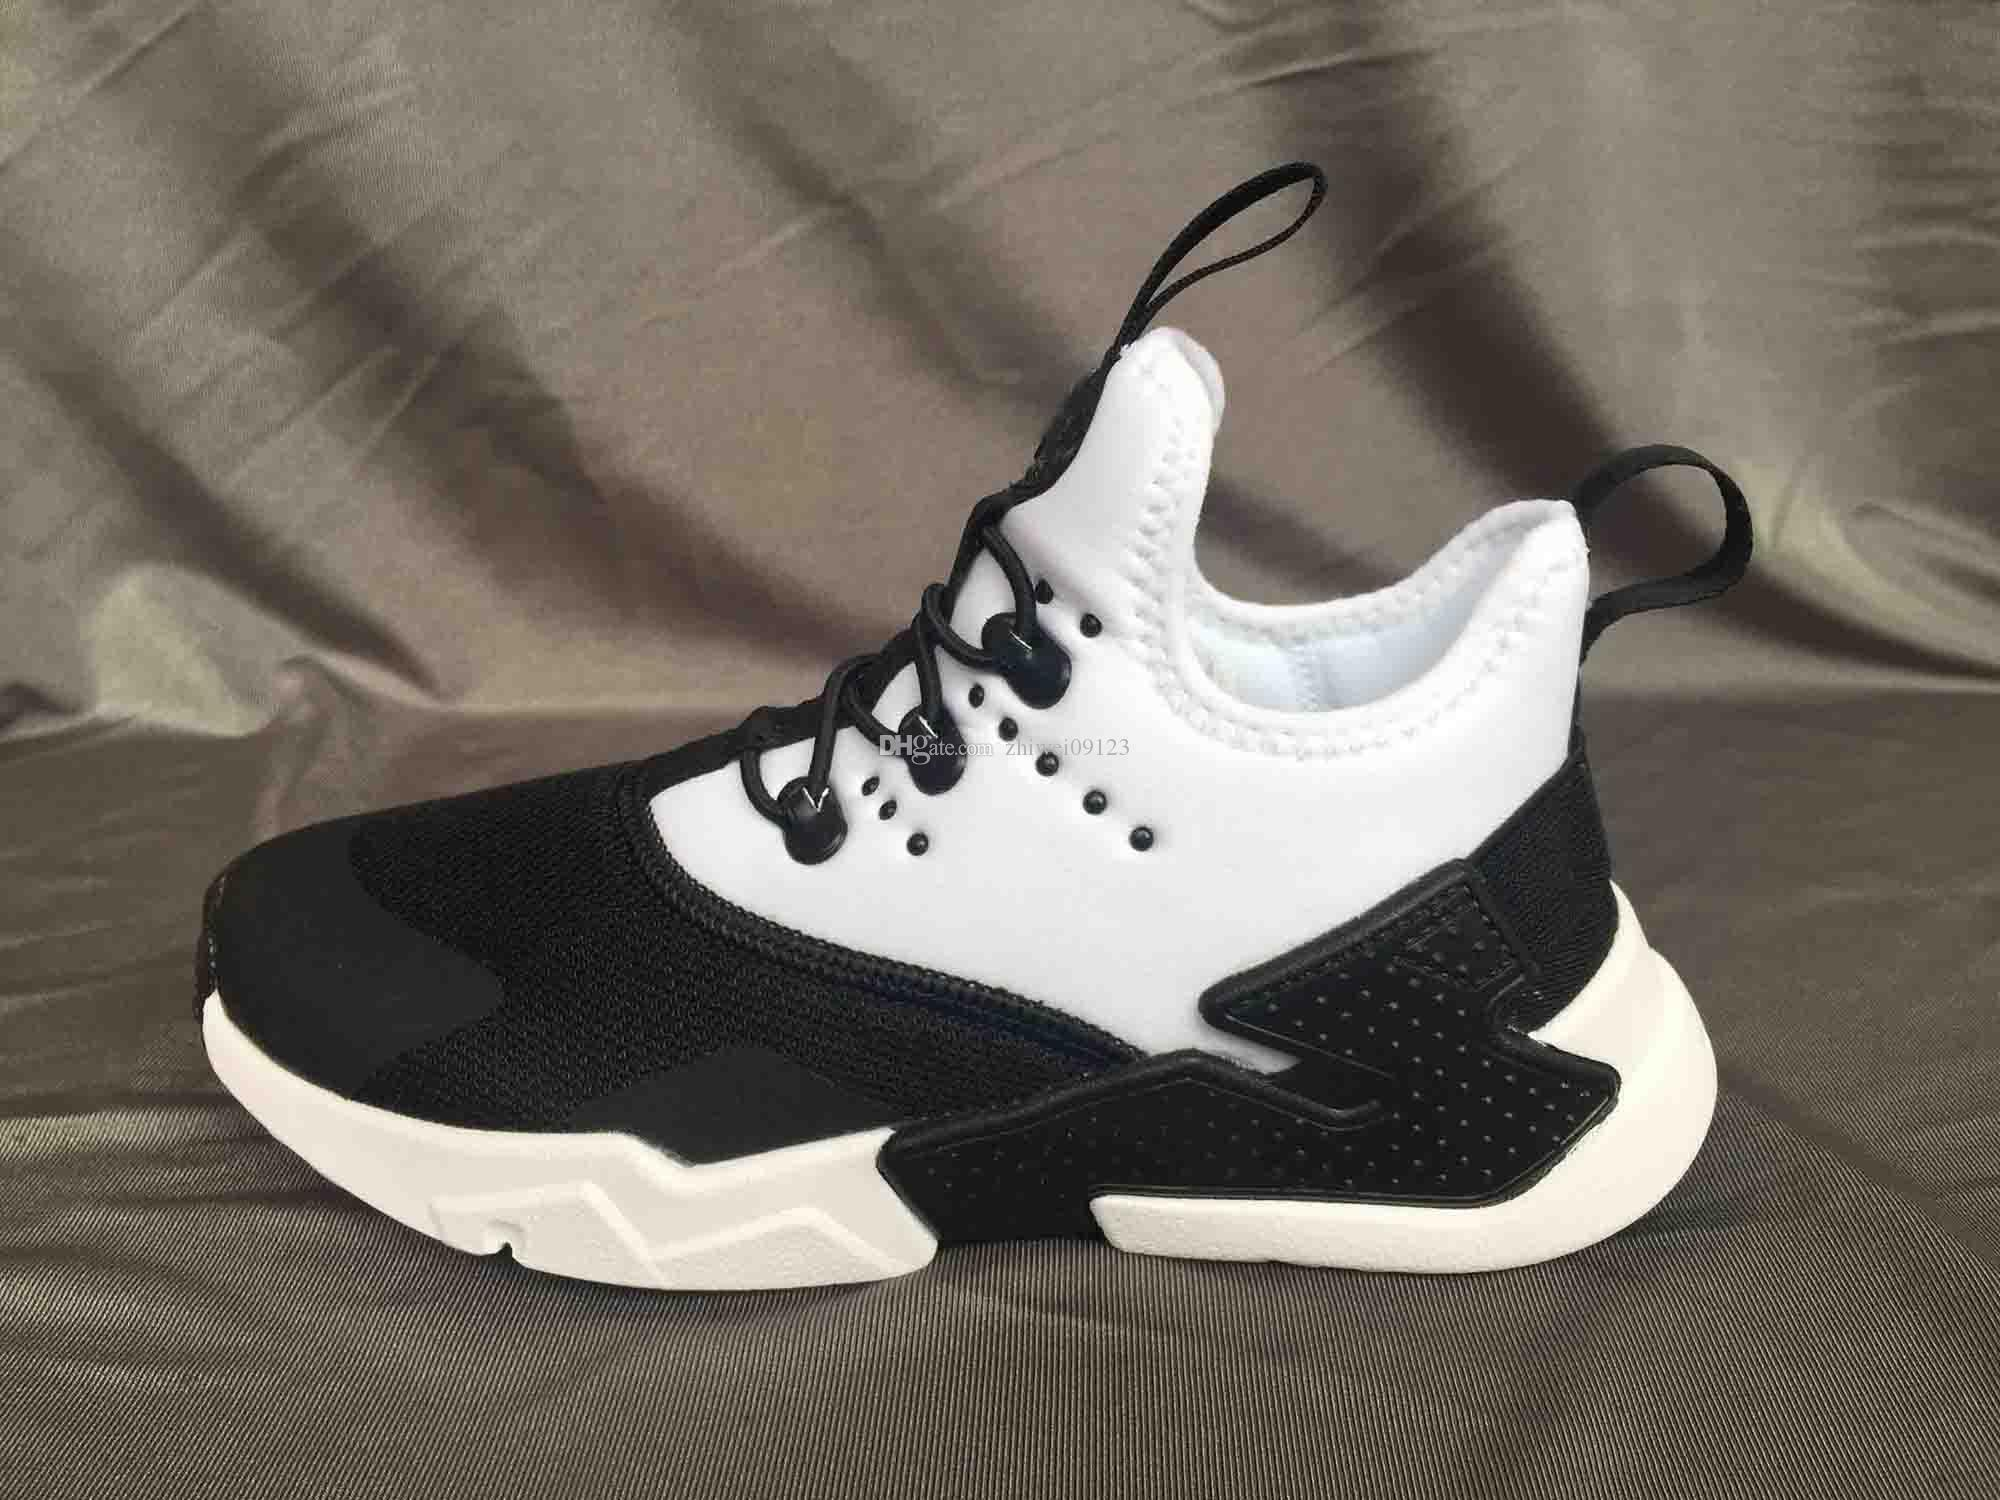 385de3a337a3 2018 New Air Huarache Ultra Running Shoes Huaraches Rainbow Hurache Breathe  Shoes Big Kids Men Women Huraches Zapatos Trainers Sneakers 35 Running Shoes  ...